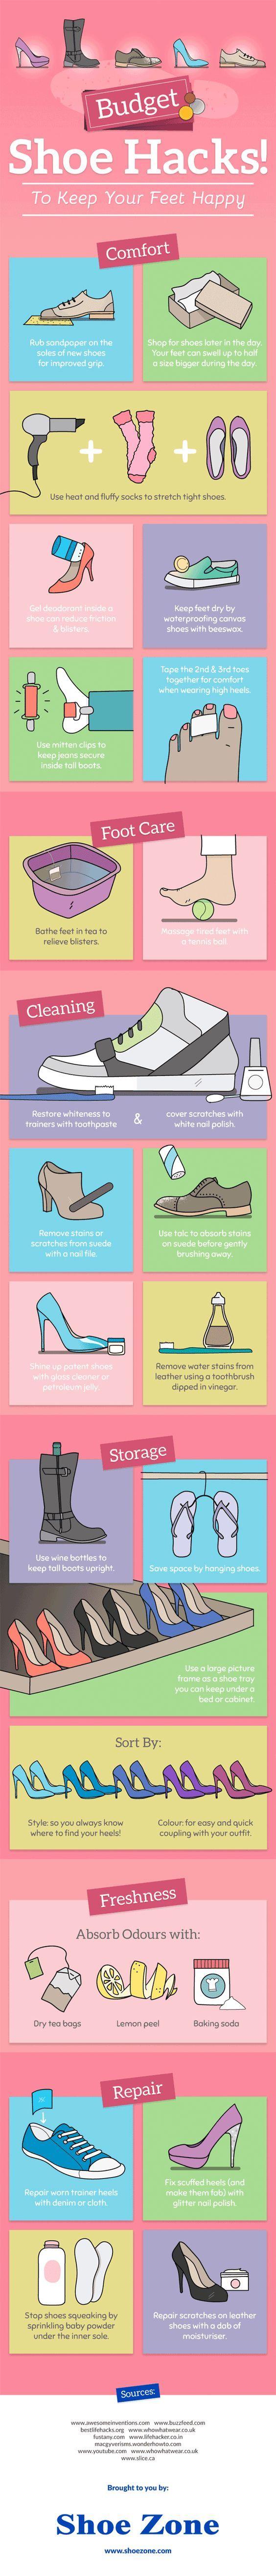 Infographic: Shoe Hacks for Happy Feet | Mental Floss